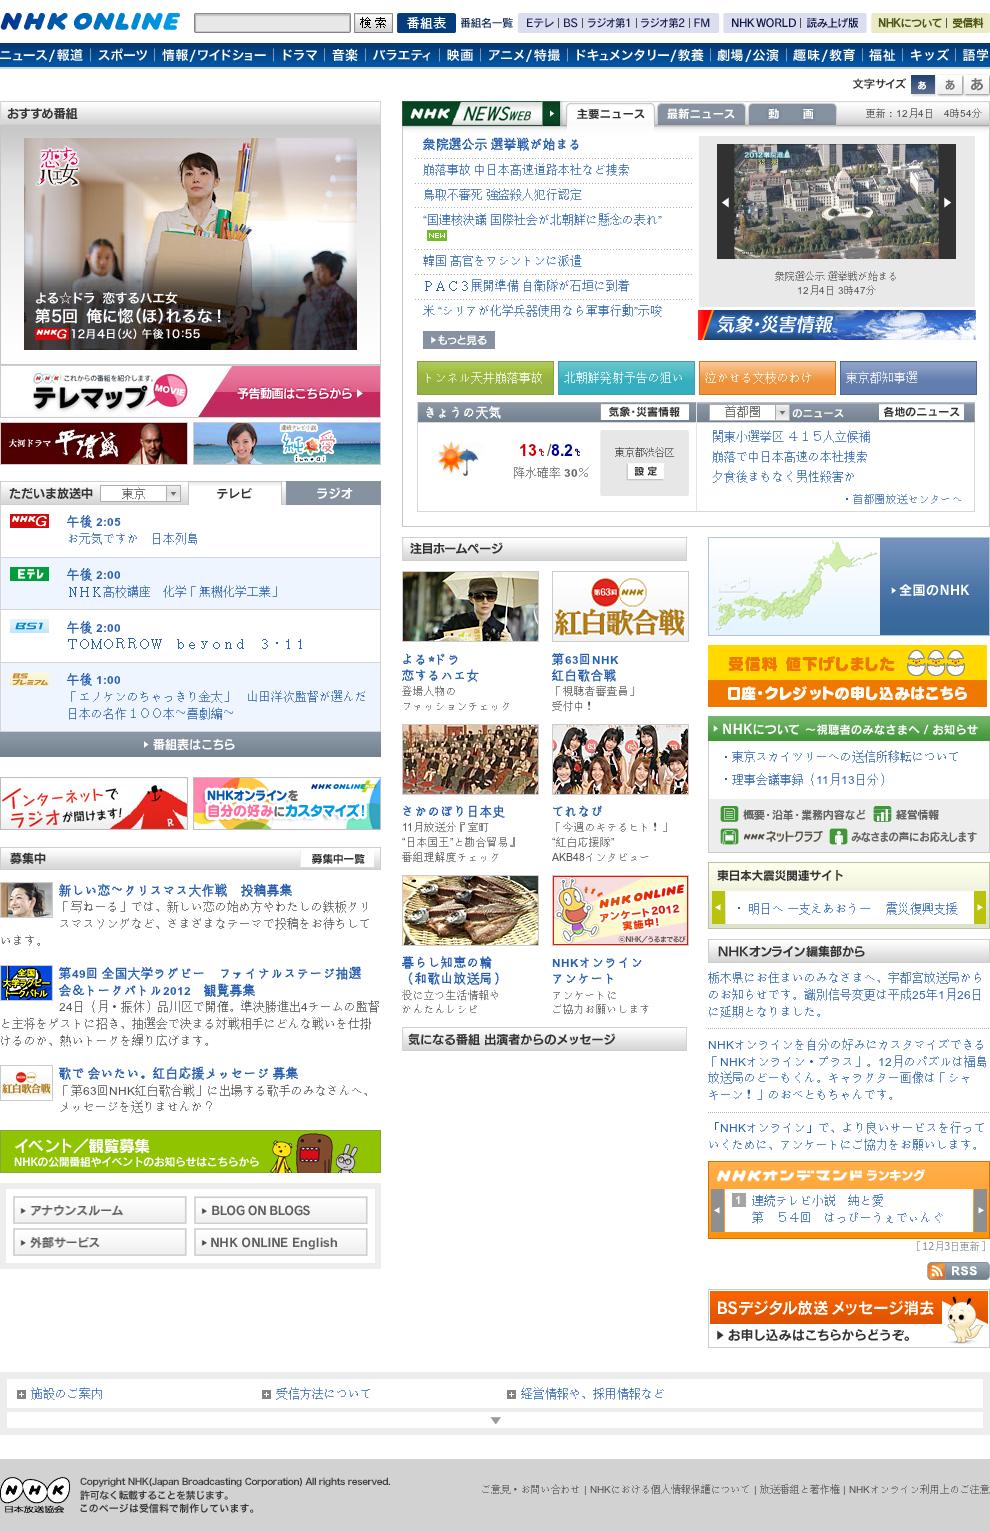 NHK Online at Tuesday Dec. 4, 2012, 5:24 a.m. UTC